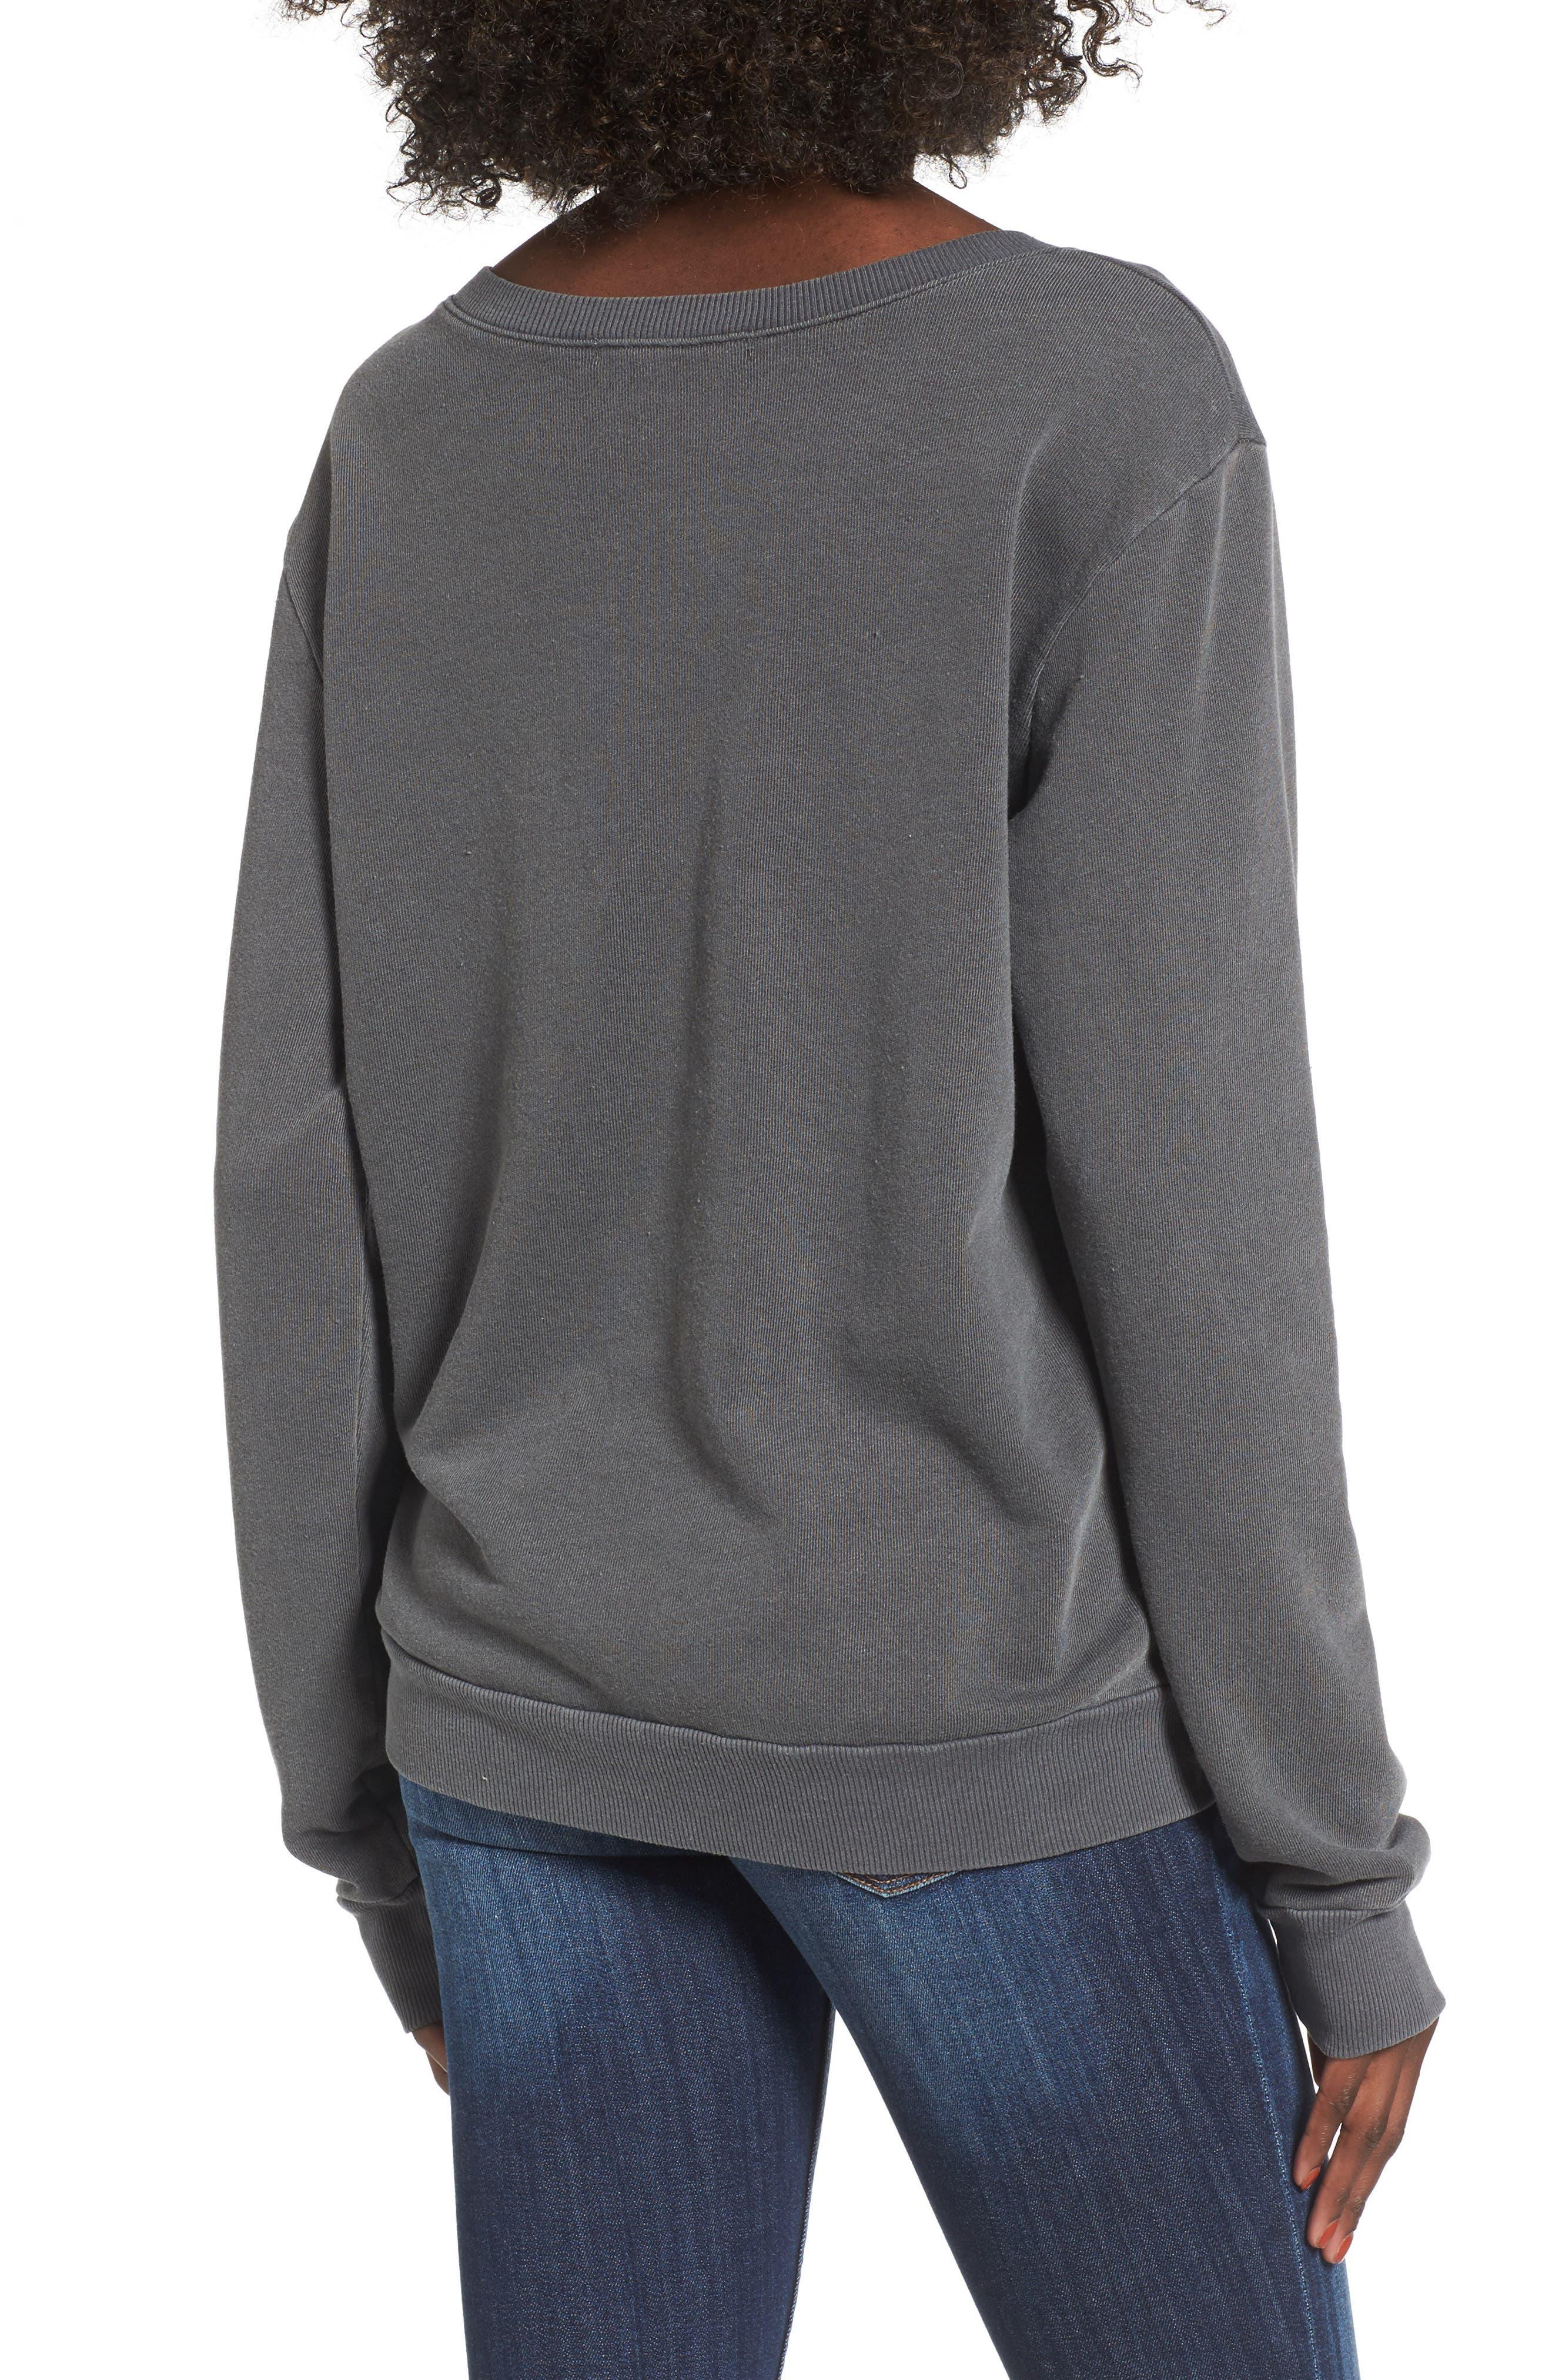 Def Leppard Sweatshirt,                             Alternate thumbnail 2, color,